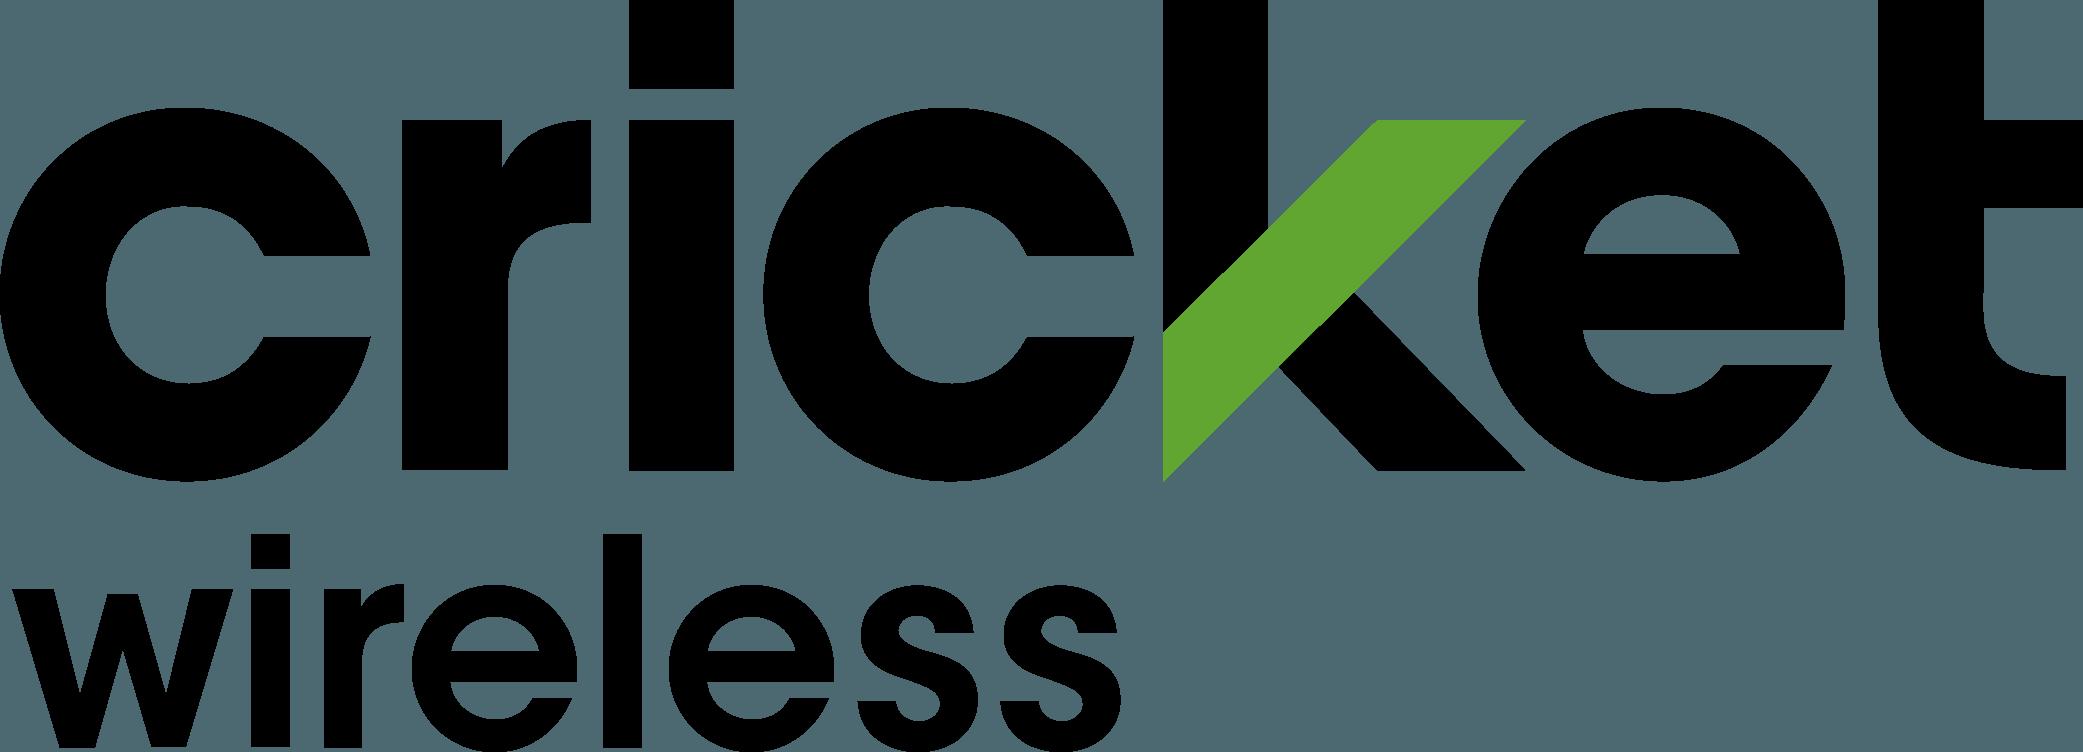 Cricket Wireless Logo Download Vector.